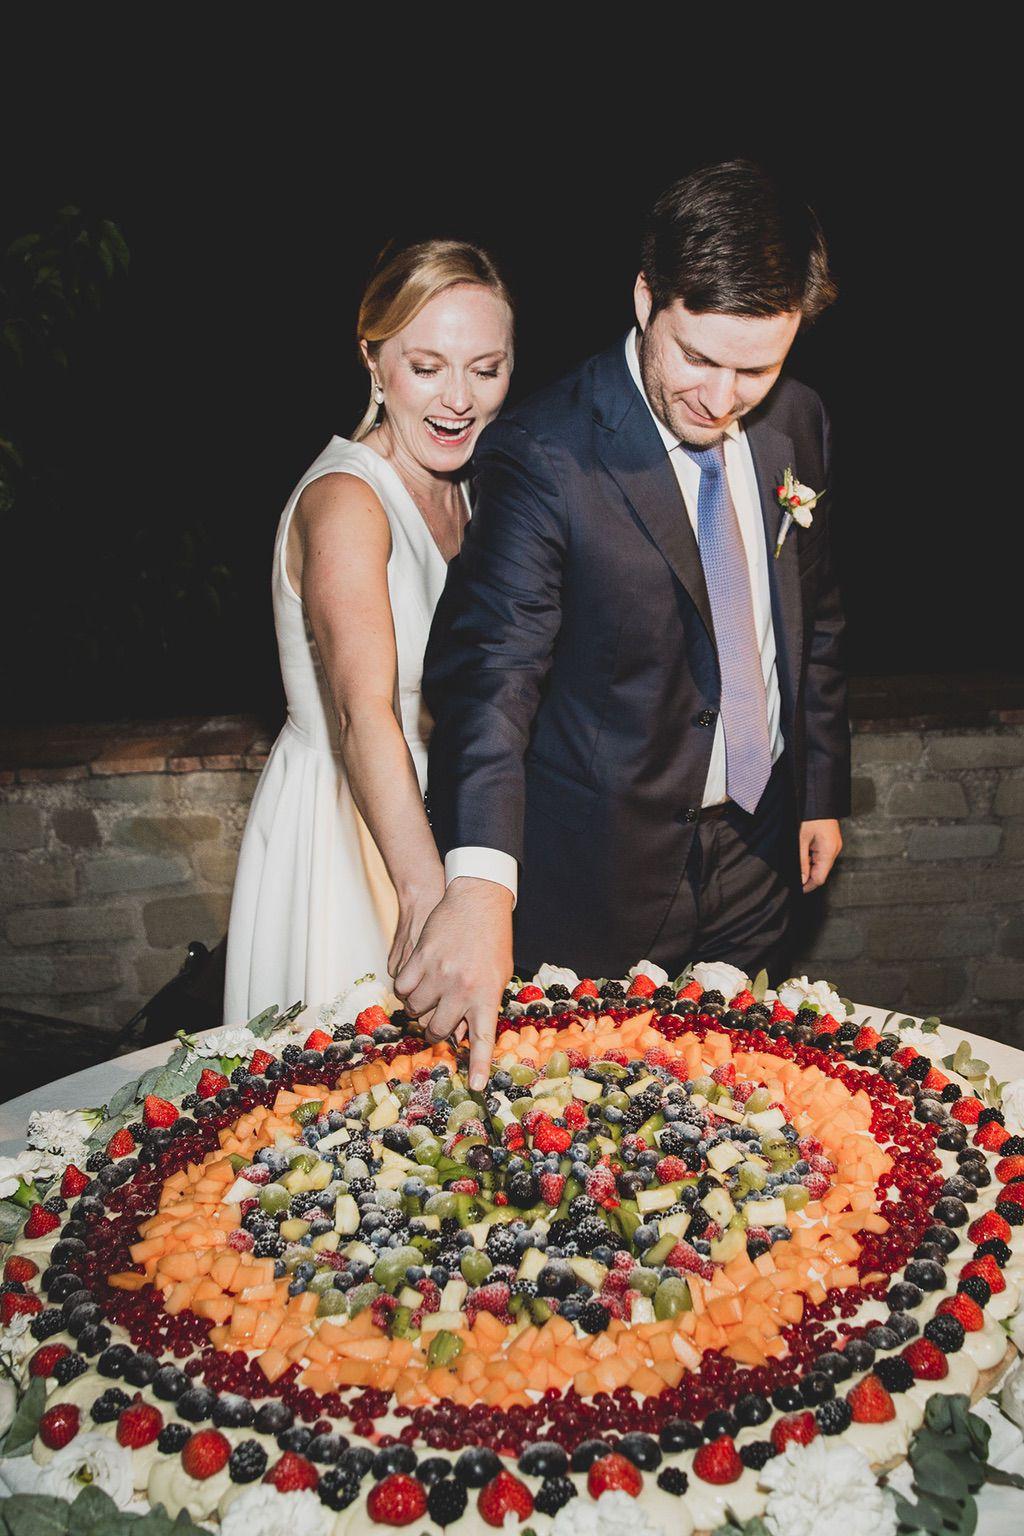 Intimate-Wedding-Florence-fruit-cake-guido-guidi-050